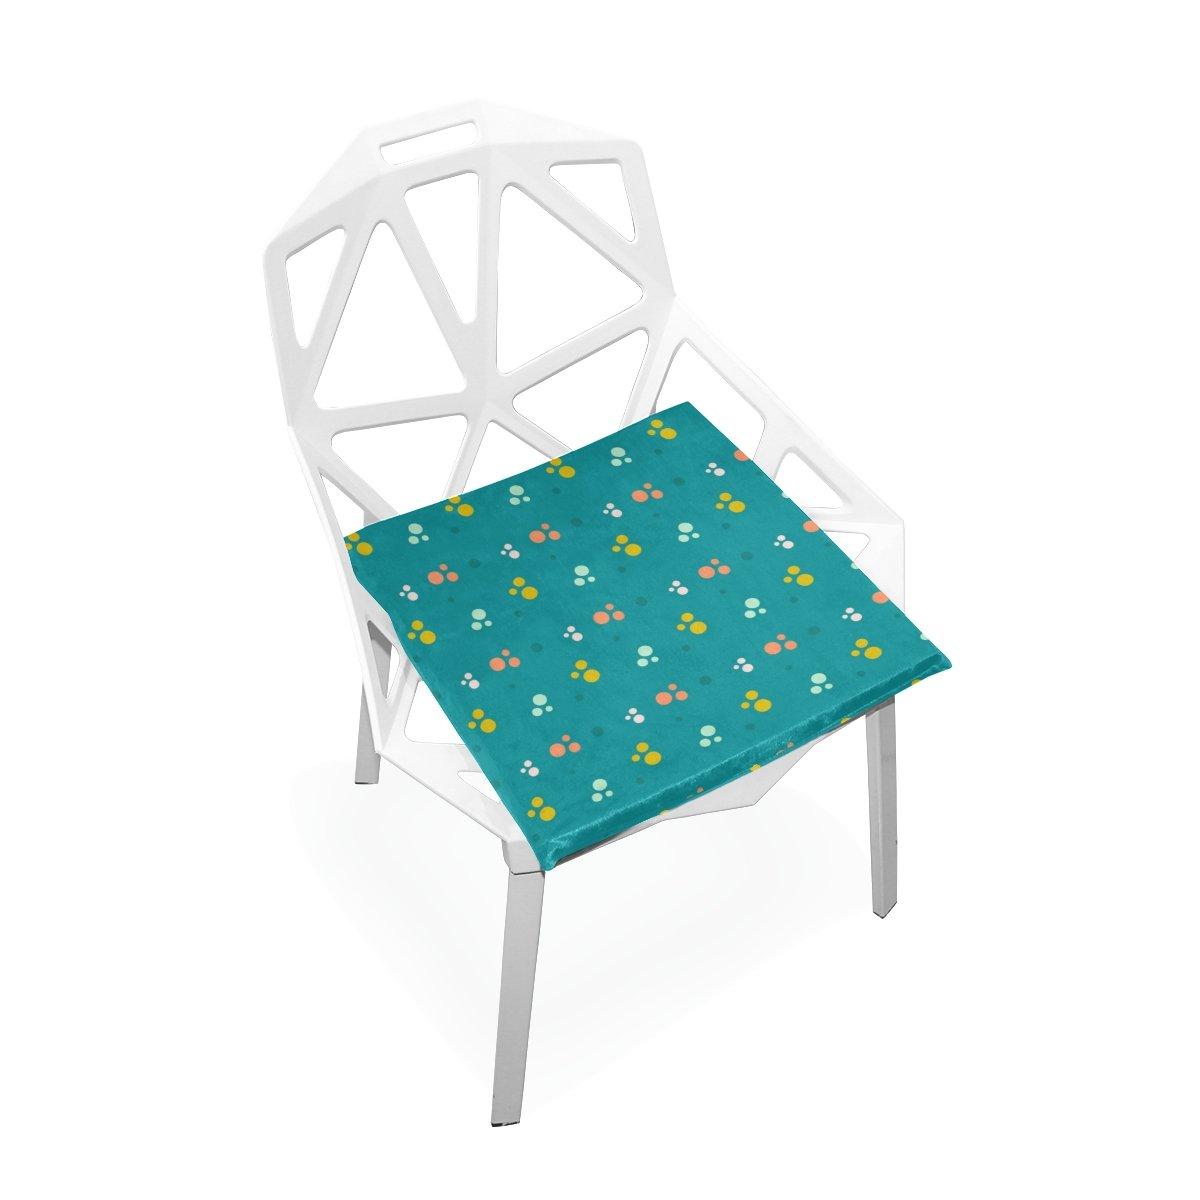 Amazon com xinxin seat cushion colorful feet cushions soft chair pad nonslip chair pads cushions home decor for patio furniture dining room 16 x 16